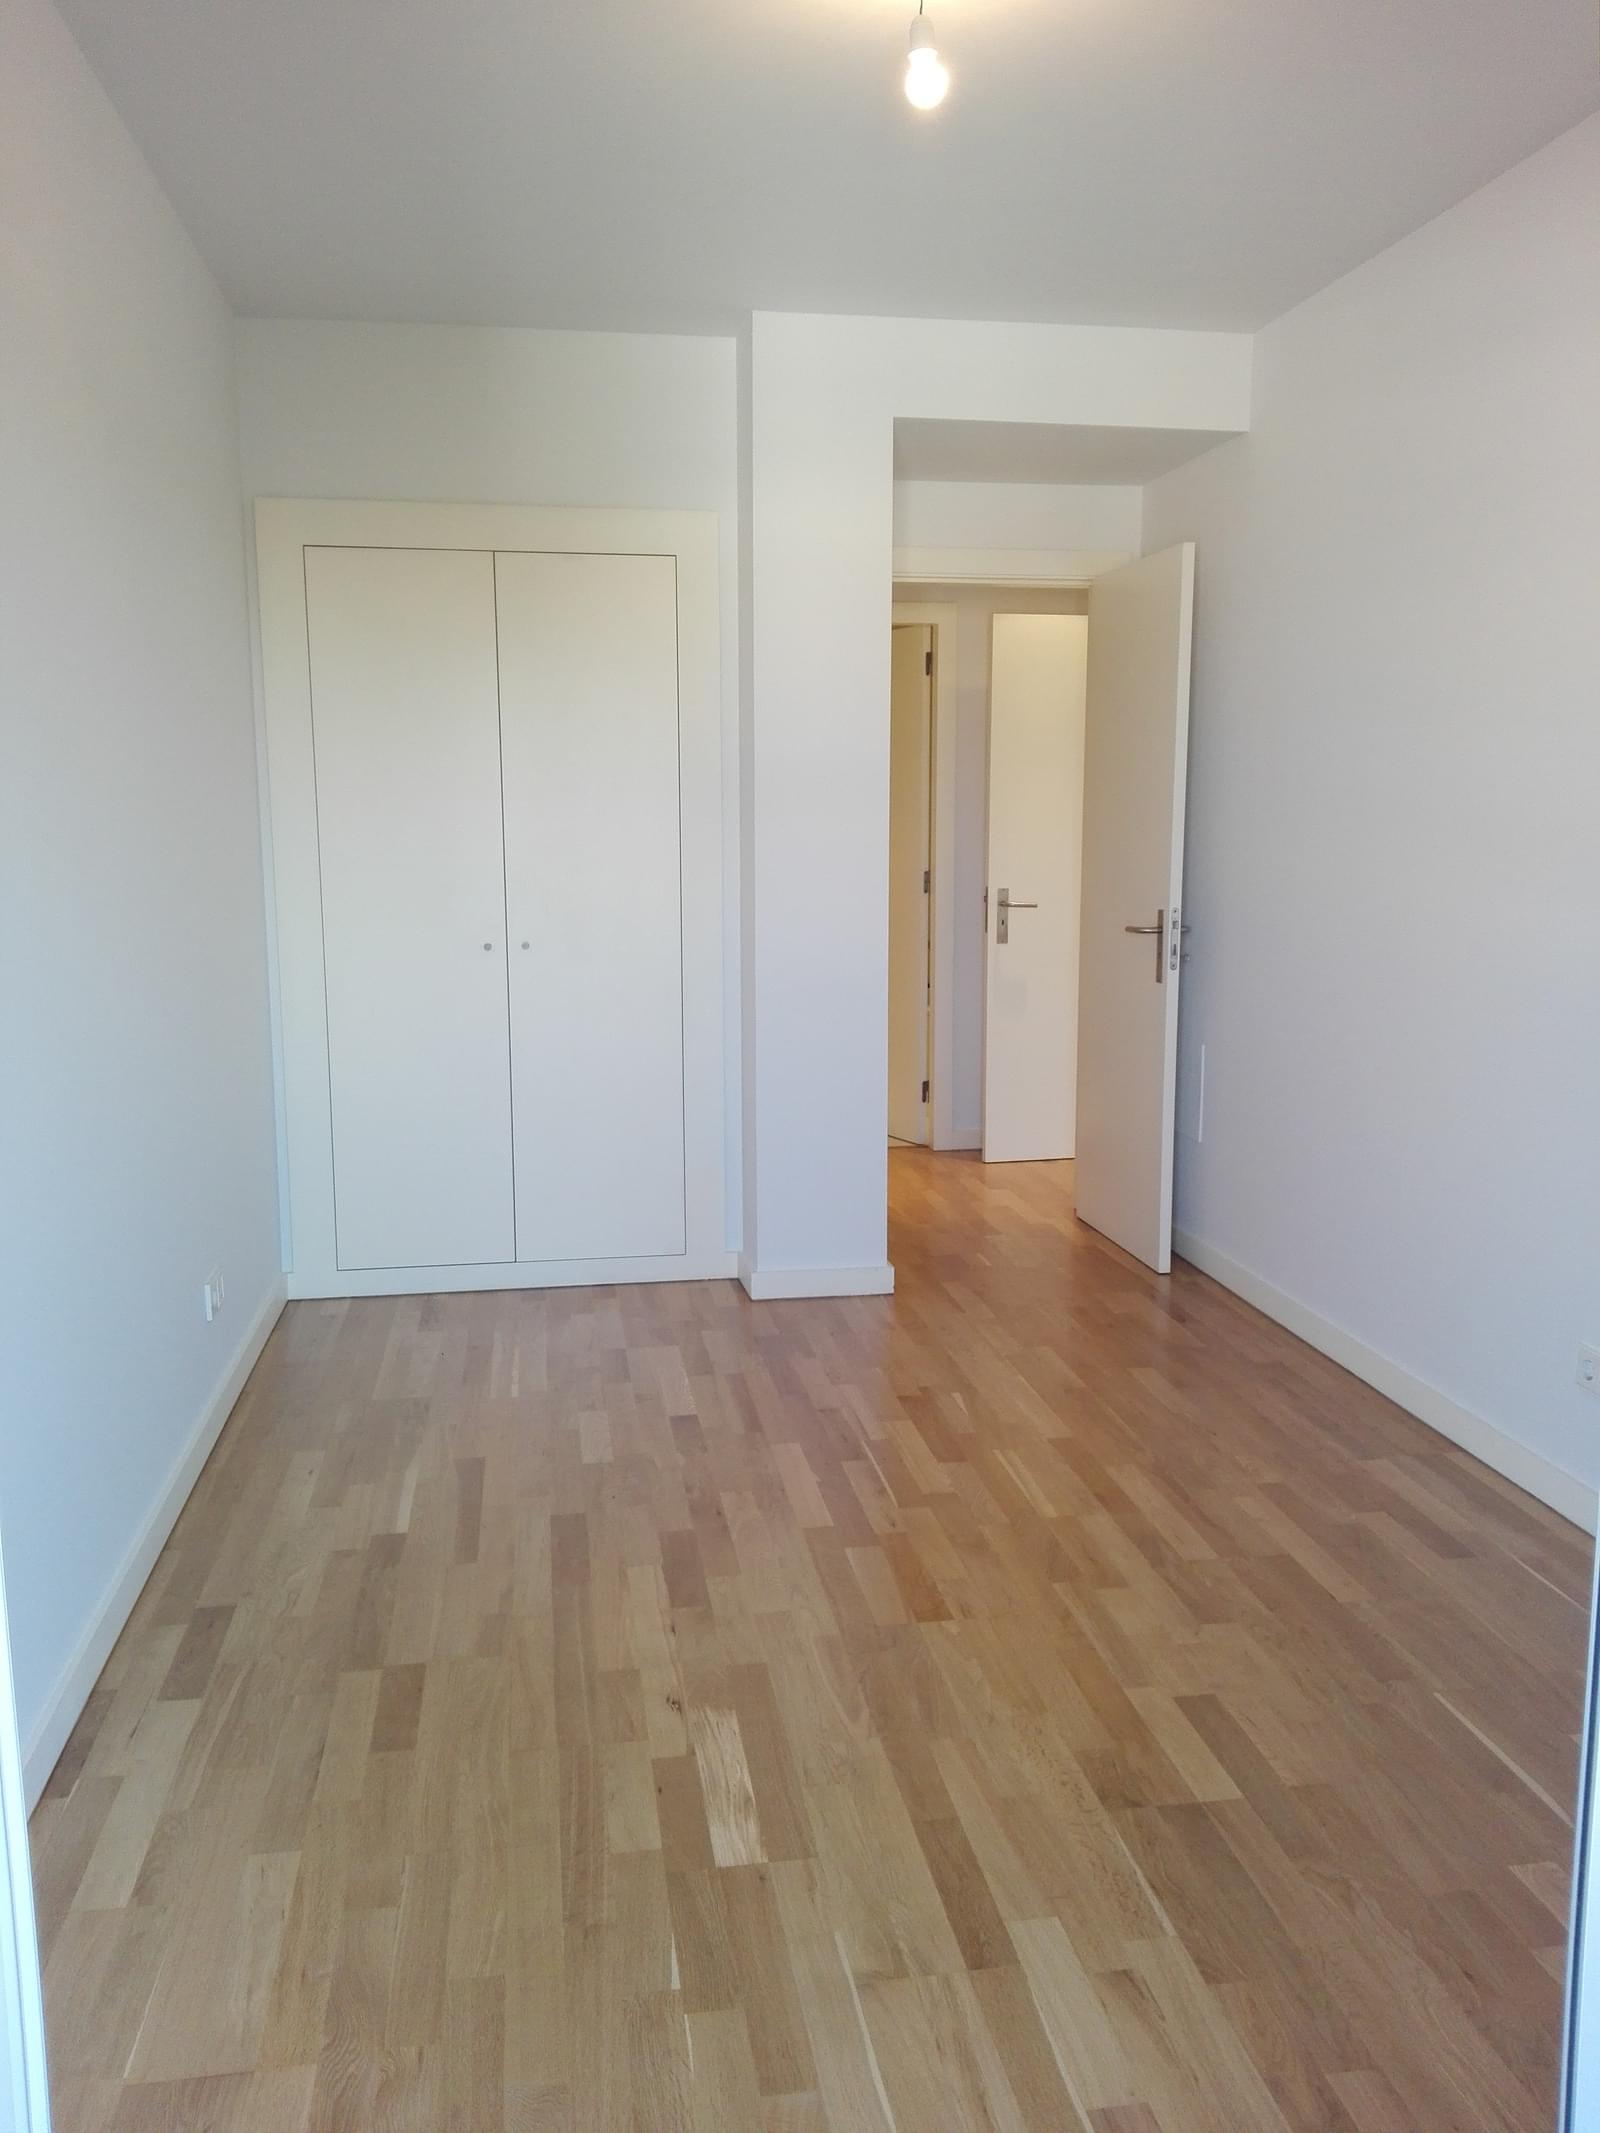 pf18814-apartamento-t2-lisboa-89663619-fdc3-4457-b37e-135b15a673dc